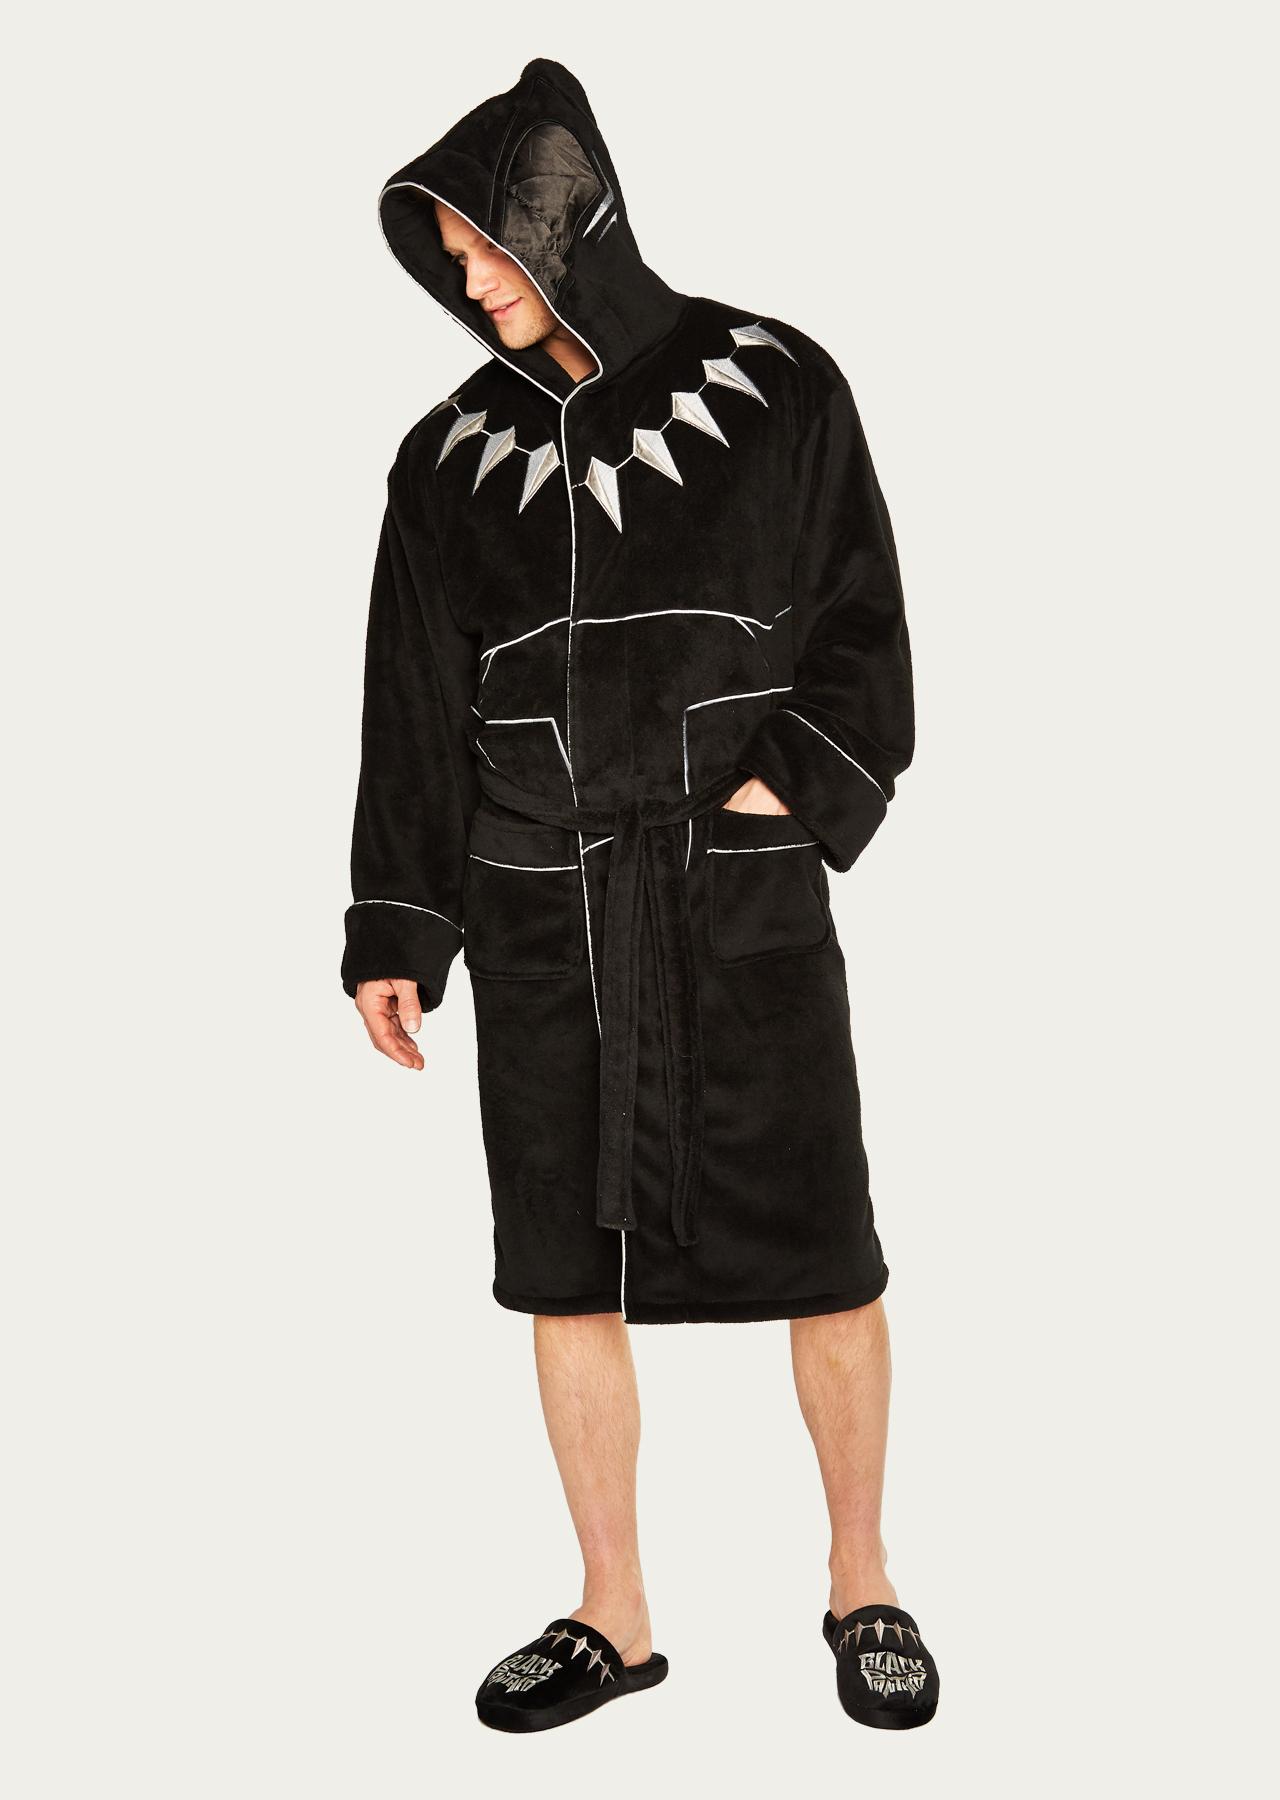 Marvel Black Panther Outfit Adult Fleece Bathrobe – Groovy UK f0bf48749